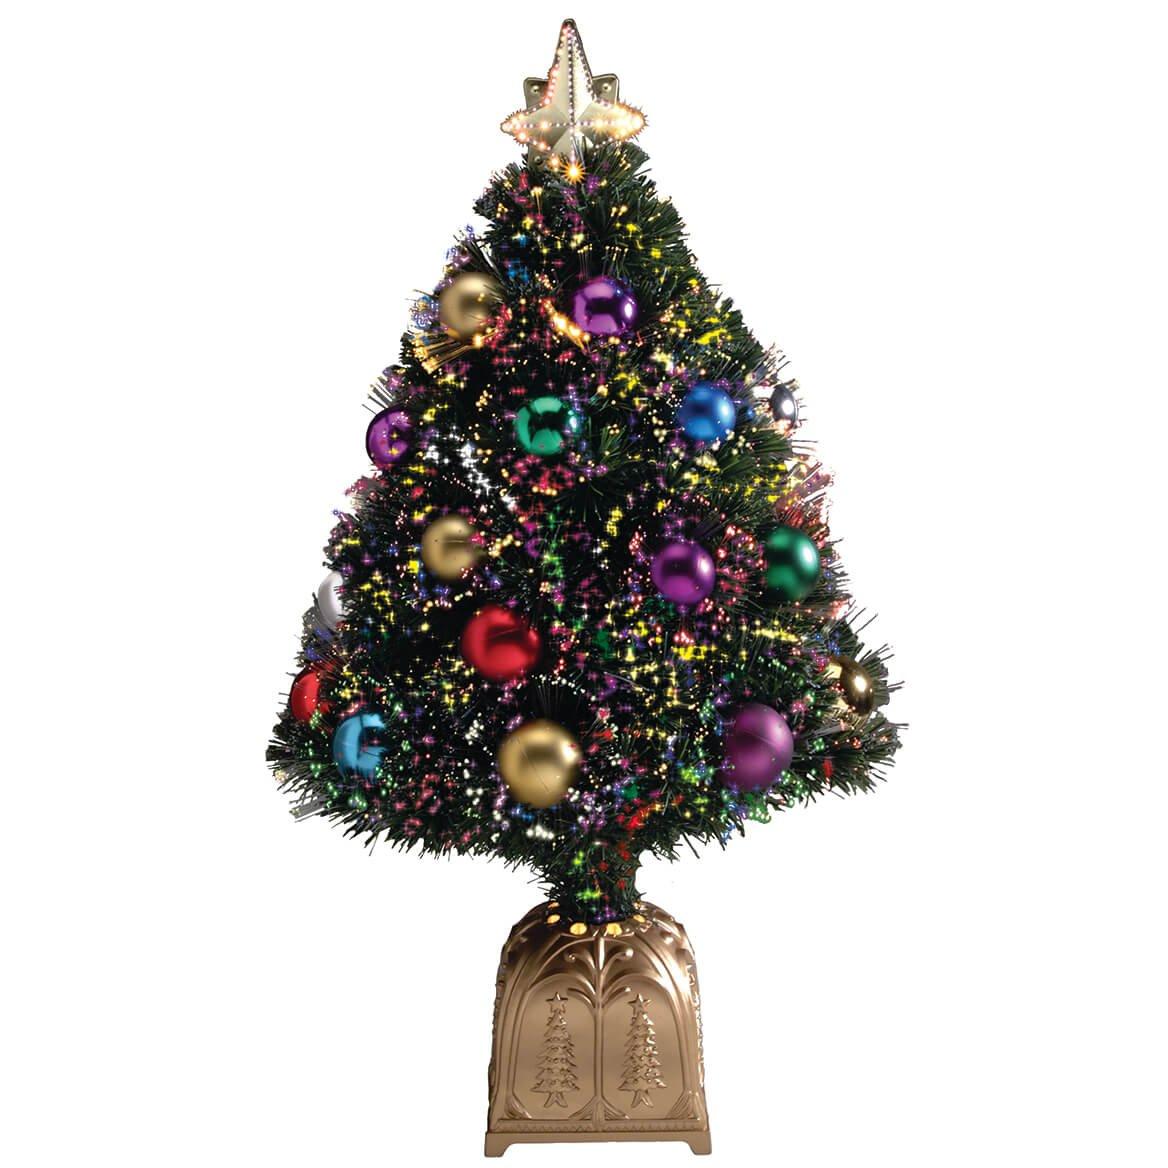 WalterDrake Fiber Optic Christmas Tree by Northwoods GreeneryTM XL